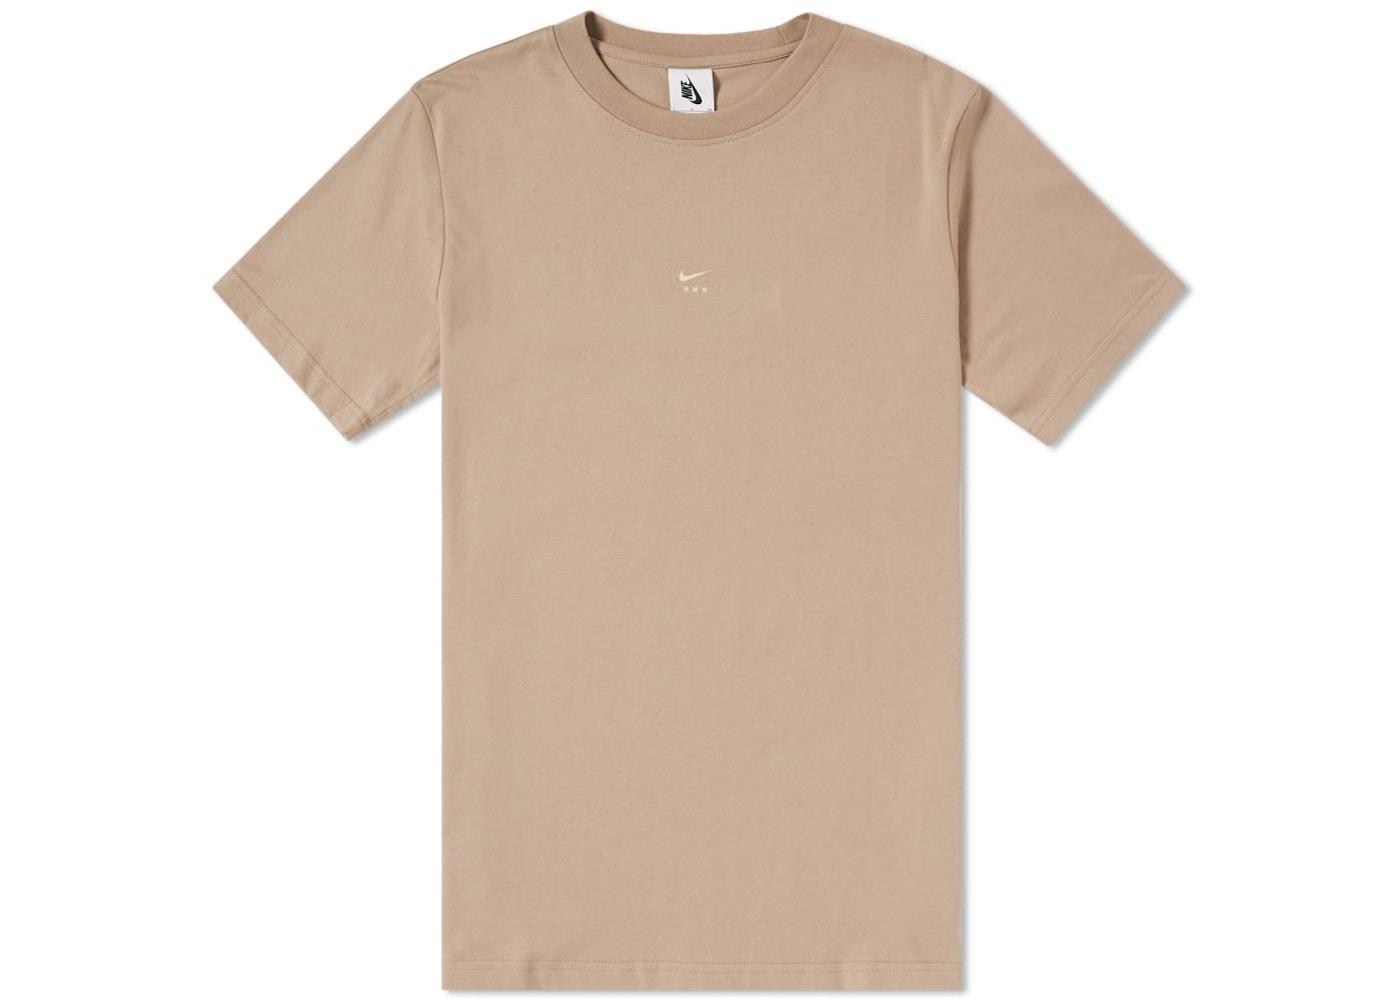 aeb61682 Nikelab x MMW Men's Graphic T-Shirt Khaki - SS18